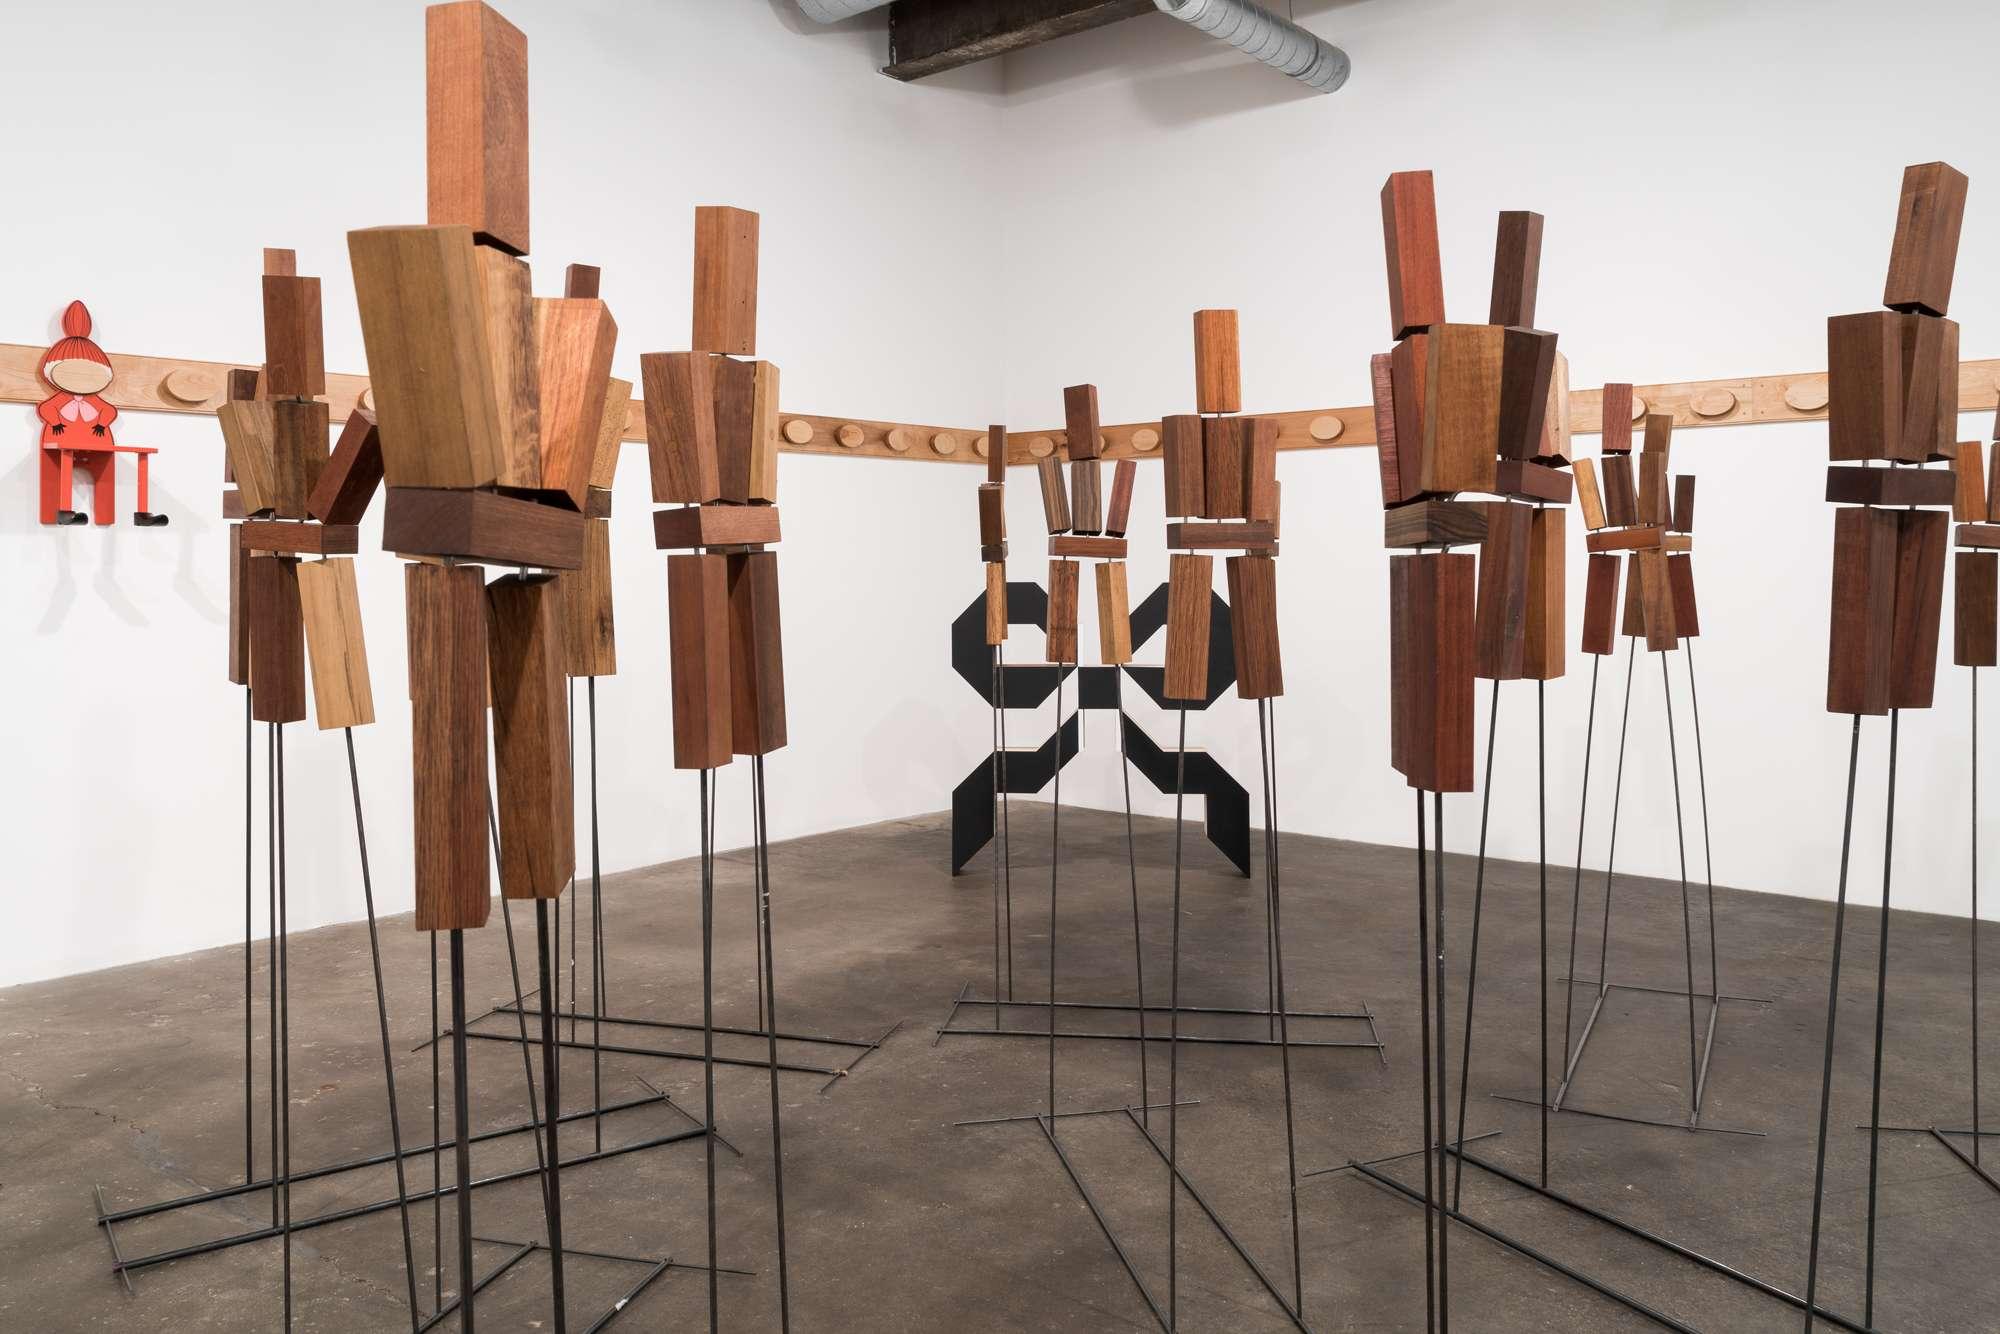 Anna Helm, Lisa Lapinski, Hirsch Perlman, installation view. © Midway Contemporary Art. Photo: Caylon Hackwith